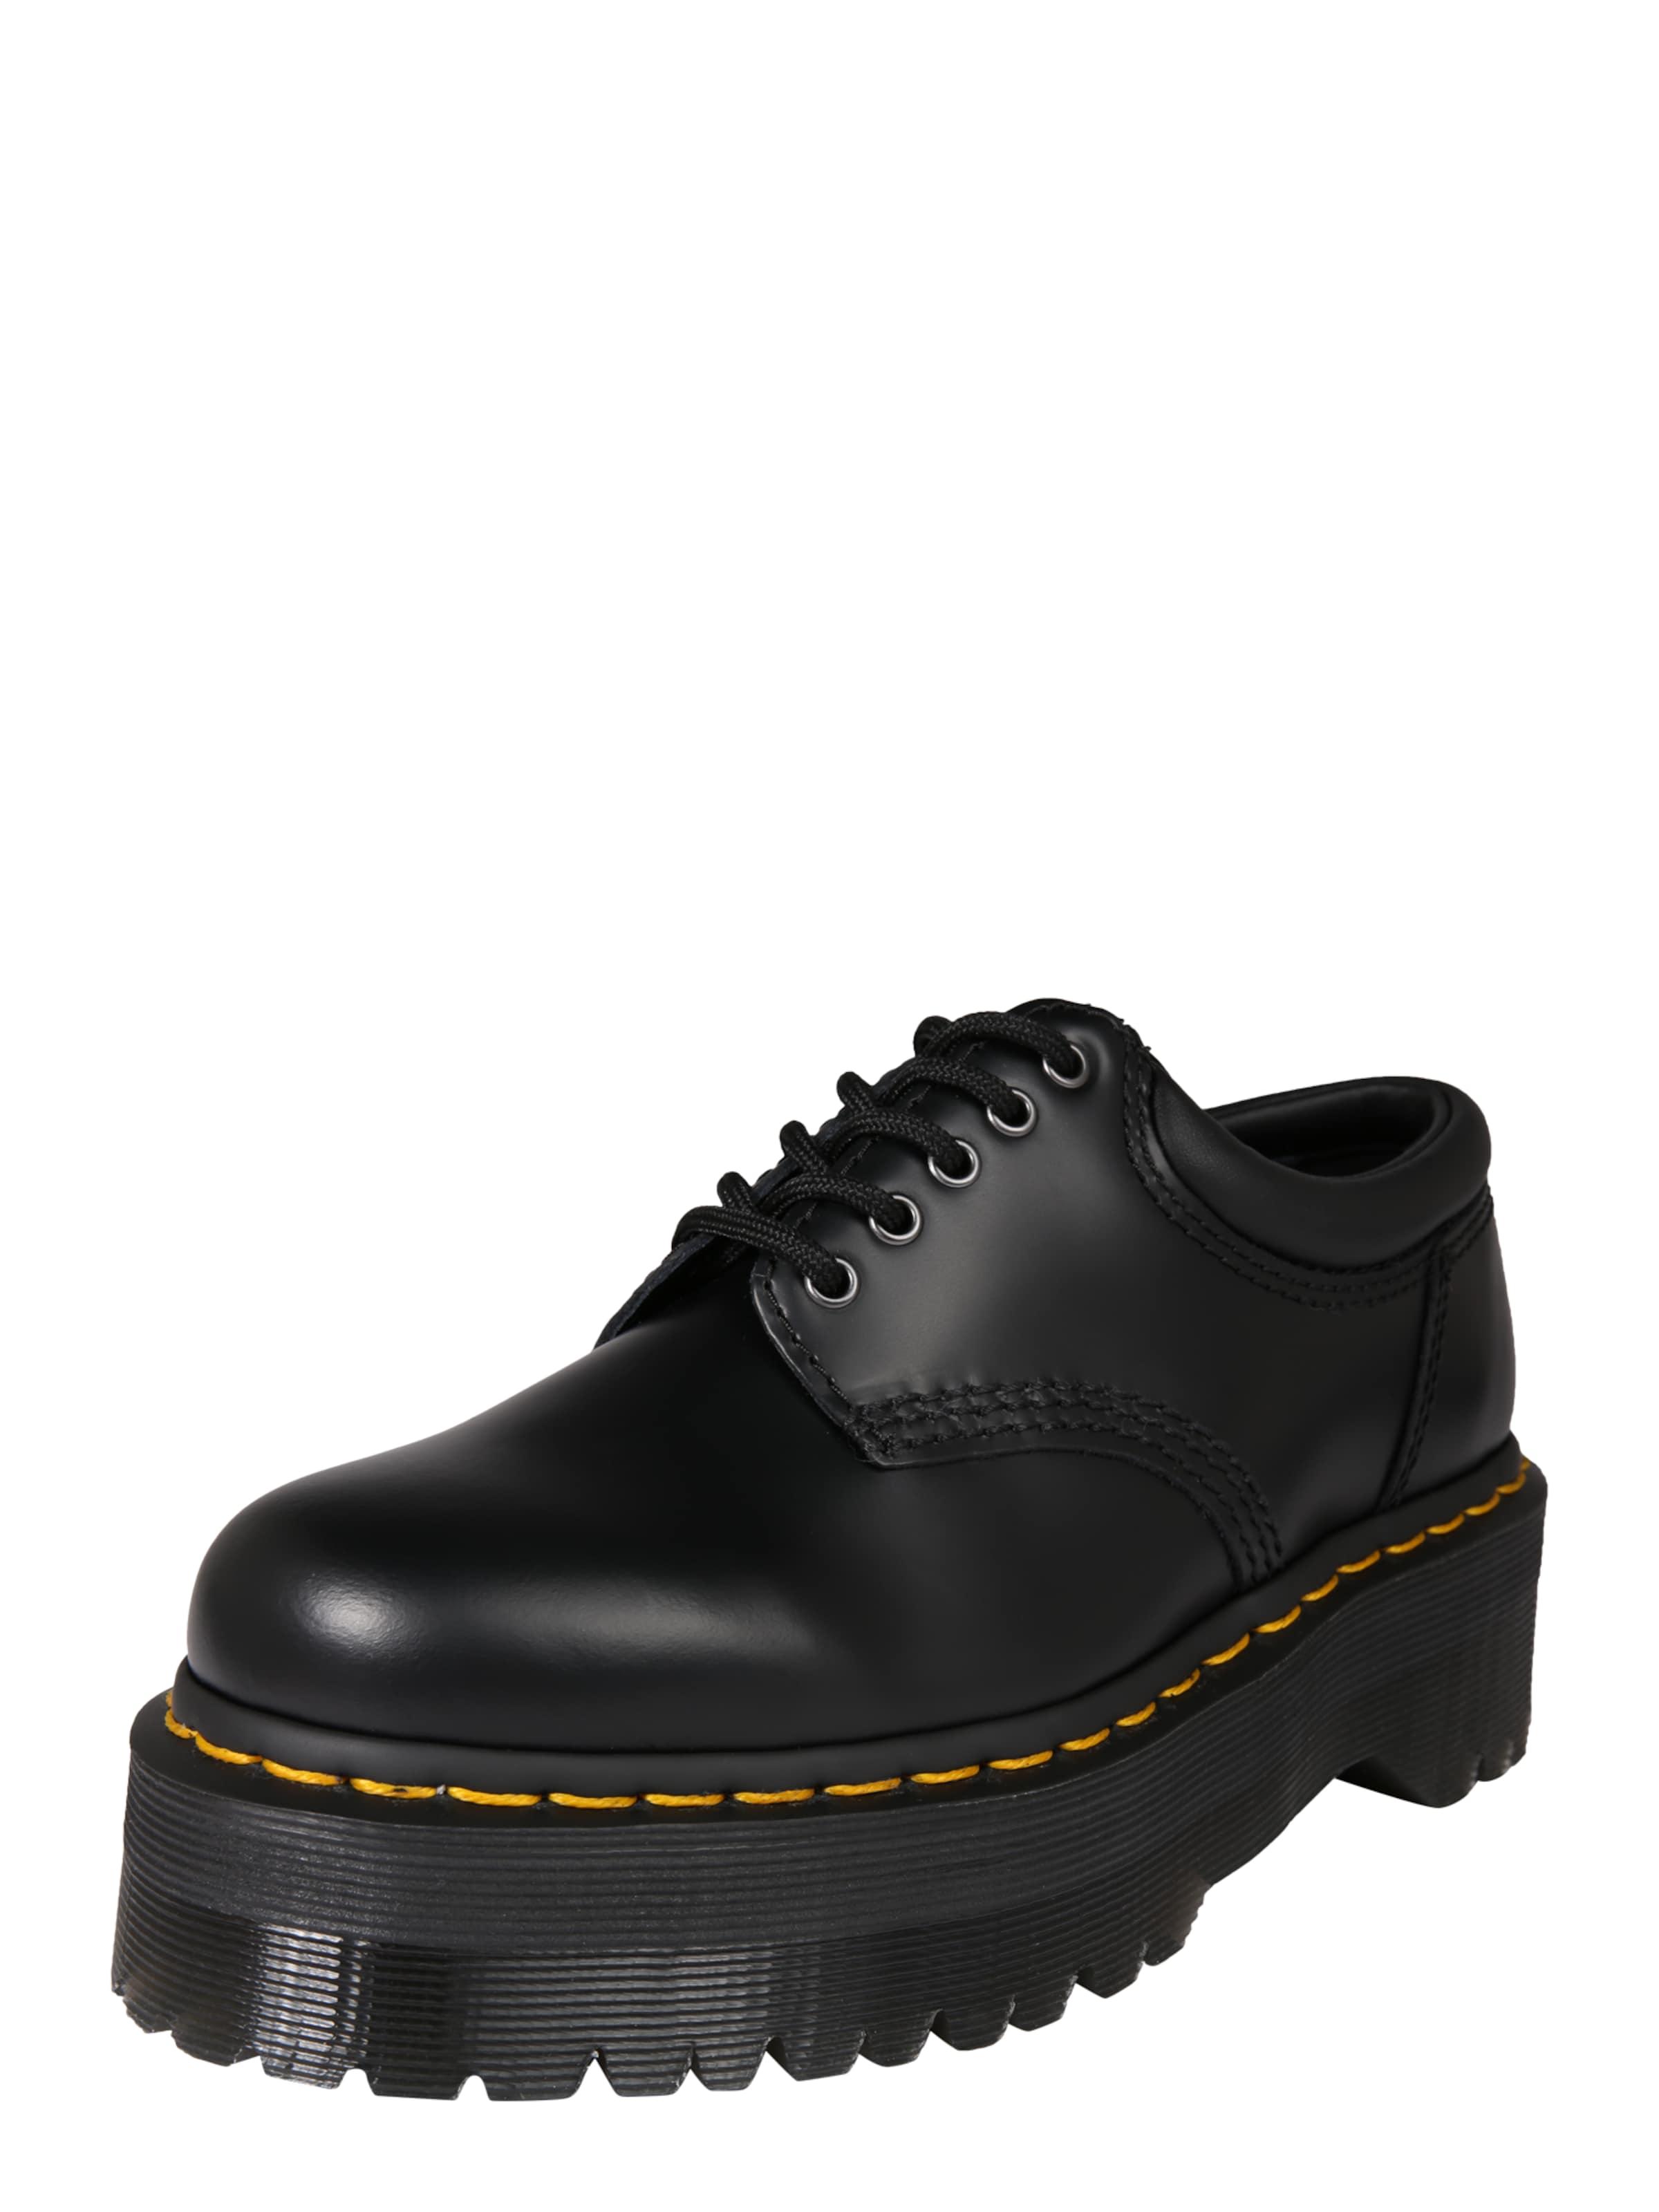 8053' Shoe In DrMartens Schnürschuhe Schwarz Tie '5 DHeWYI2E9